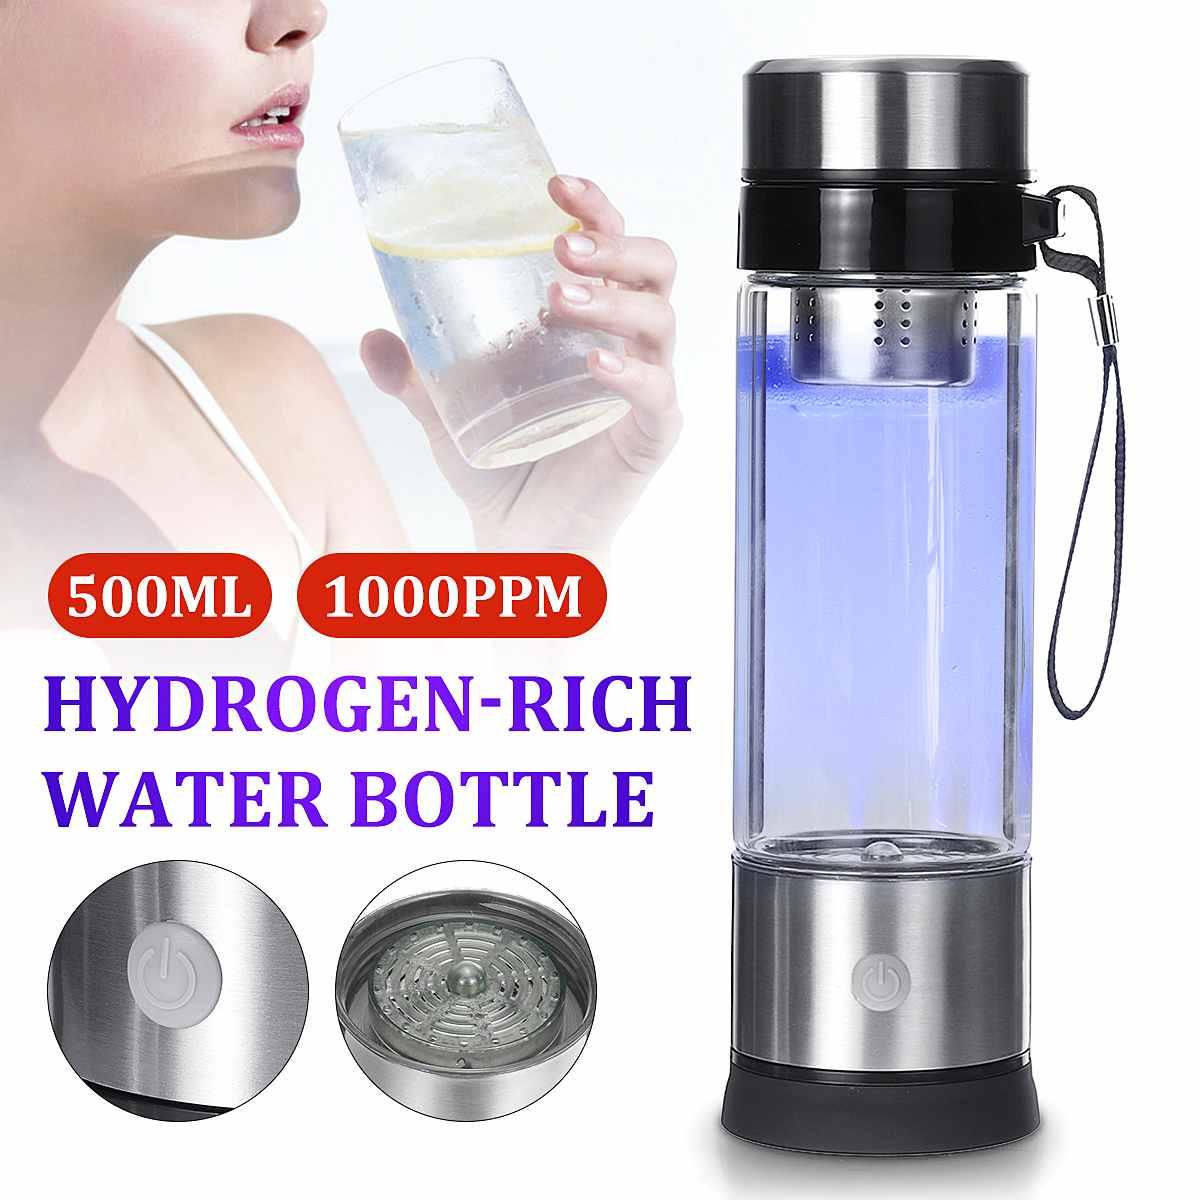 500ML Portable Hydrogen Water Generator Cup Water Filter Ionizer Maker/Generator Super Antioxidants Hydrogen Alkaline Bottle